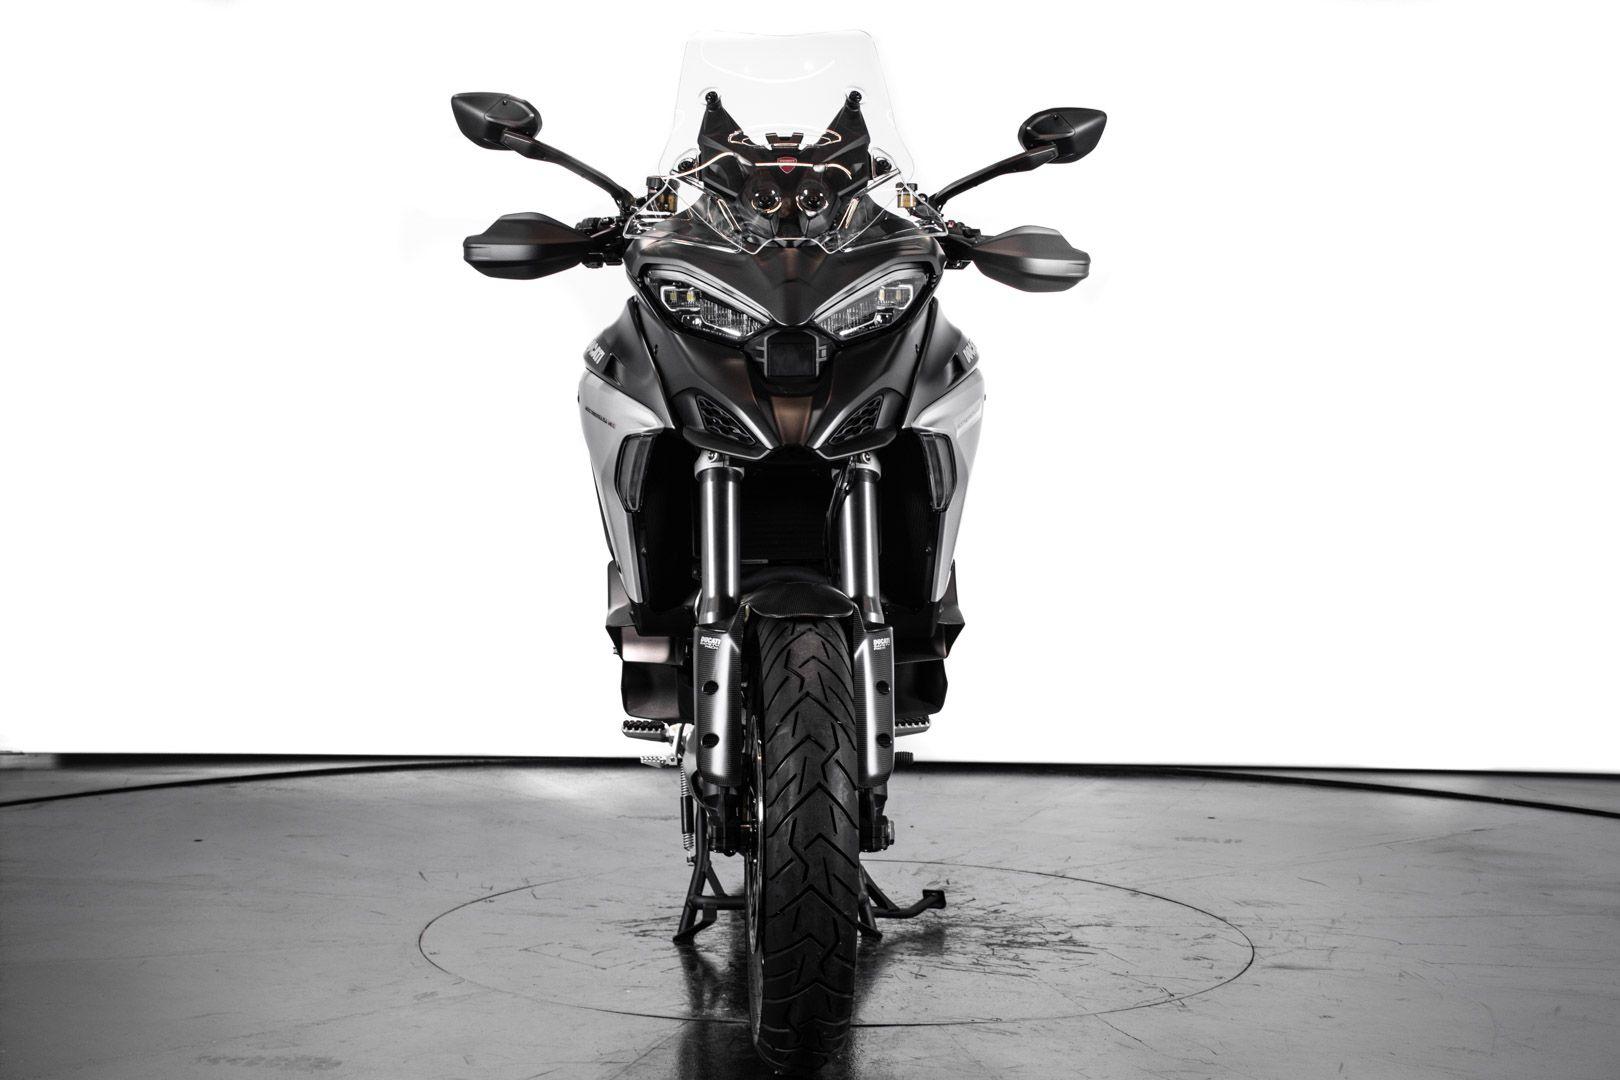 2021 Ducati MULTISTRADA V4 AVIATOR GREY FULL 84033